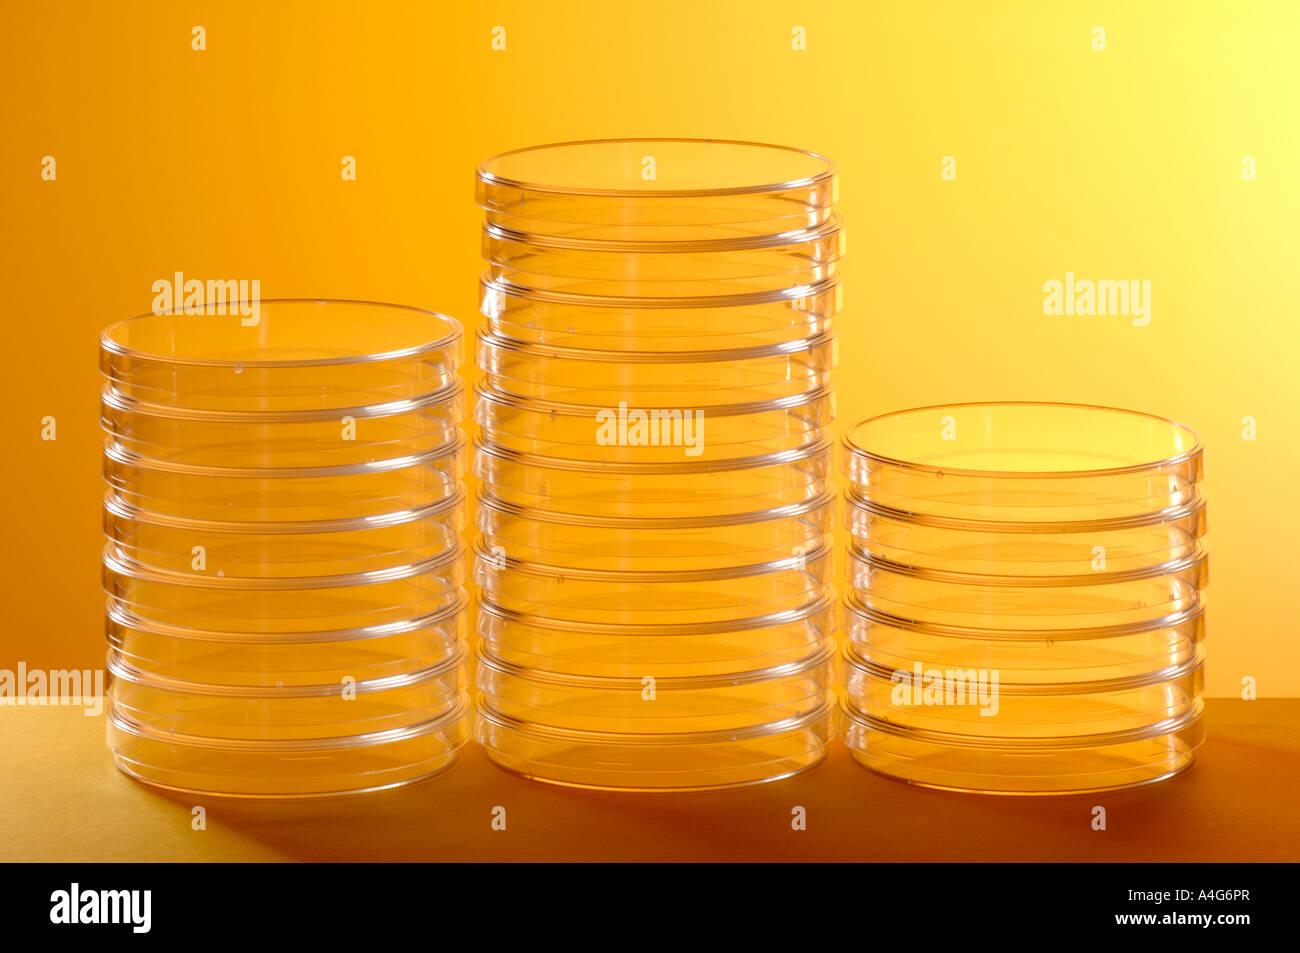 Placas de Petri científico Imagen De Stock